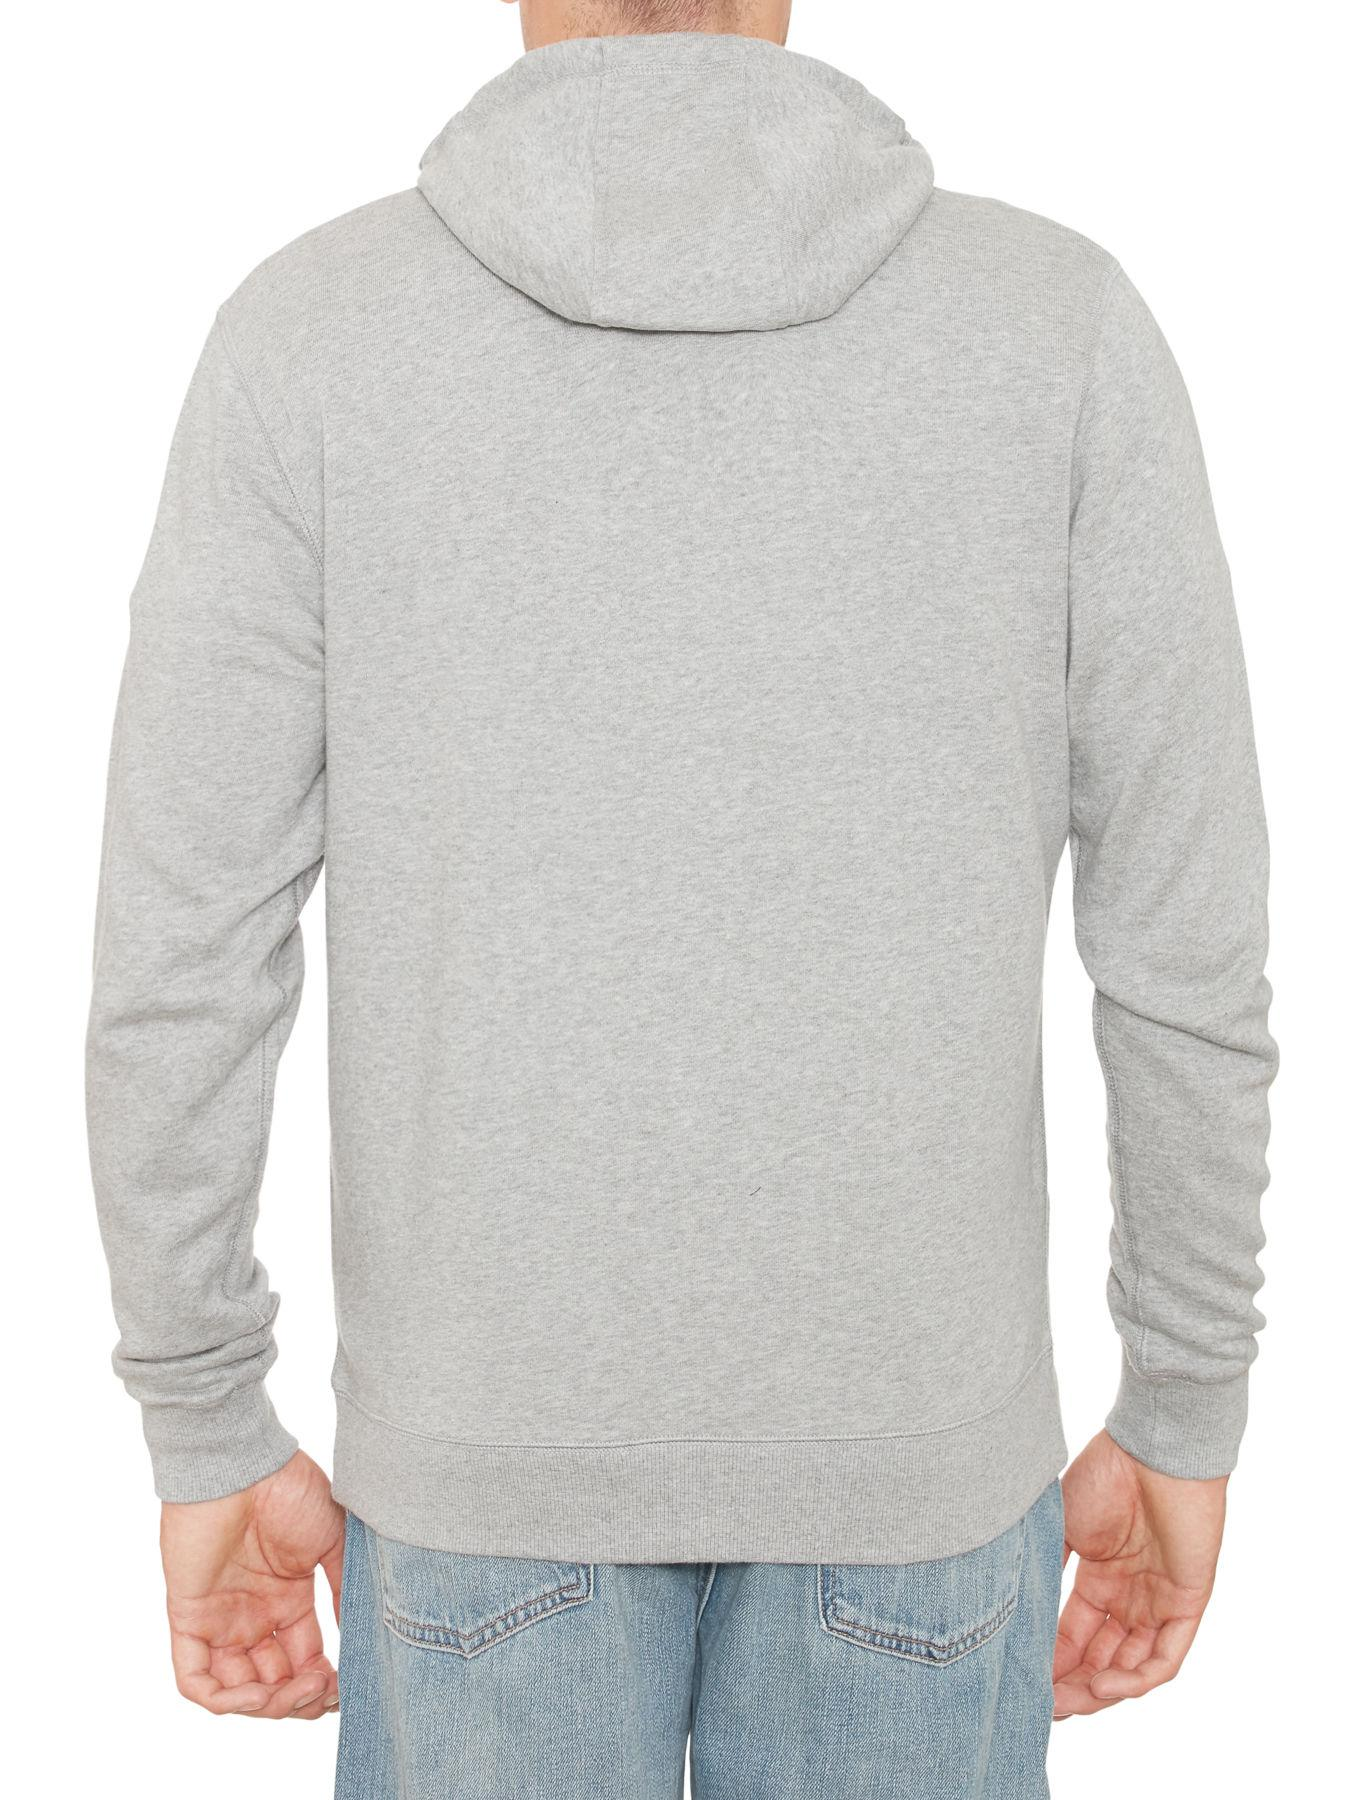 Mens-Hoodie-Sweater-by-Original-Penguin thumbnail 7